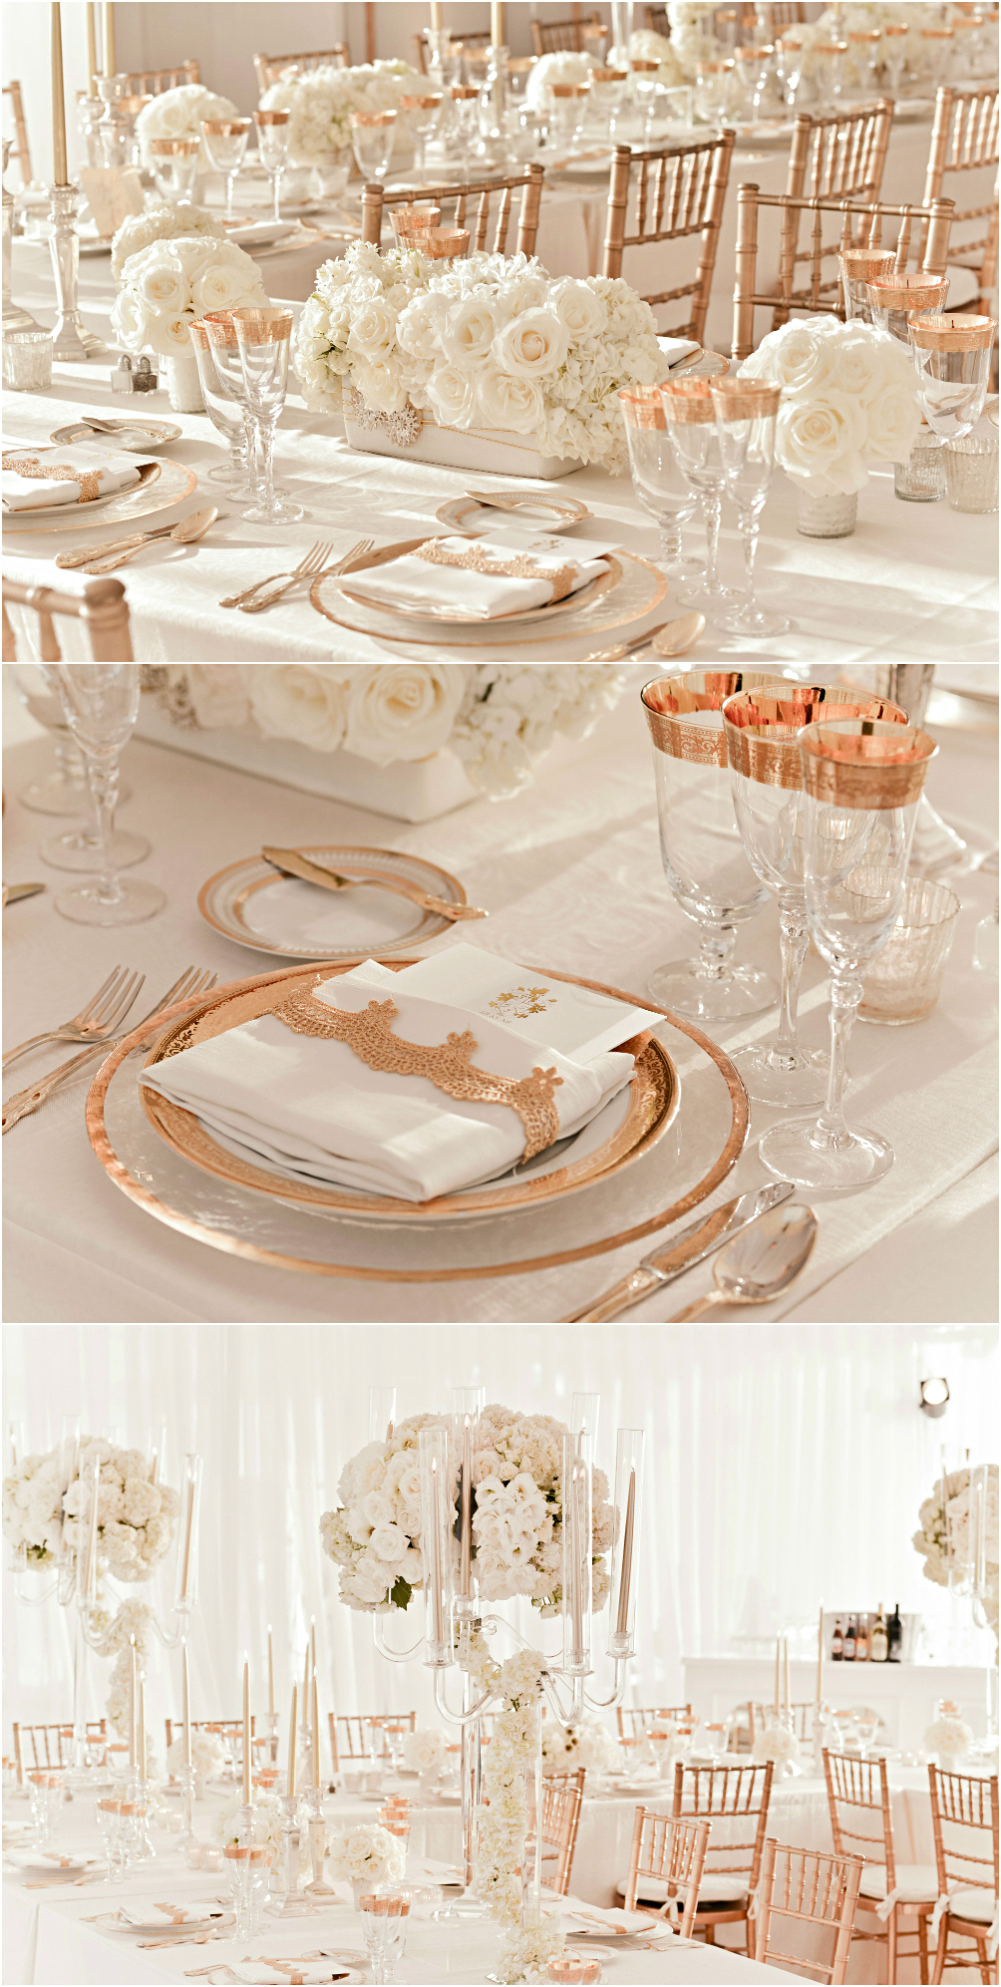 Rose Gold And Ivory Wedding Reception Decor Onewed Com